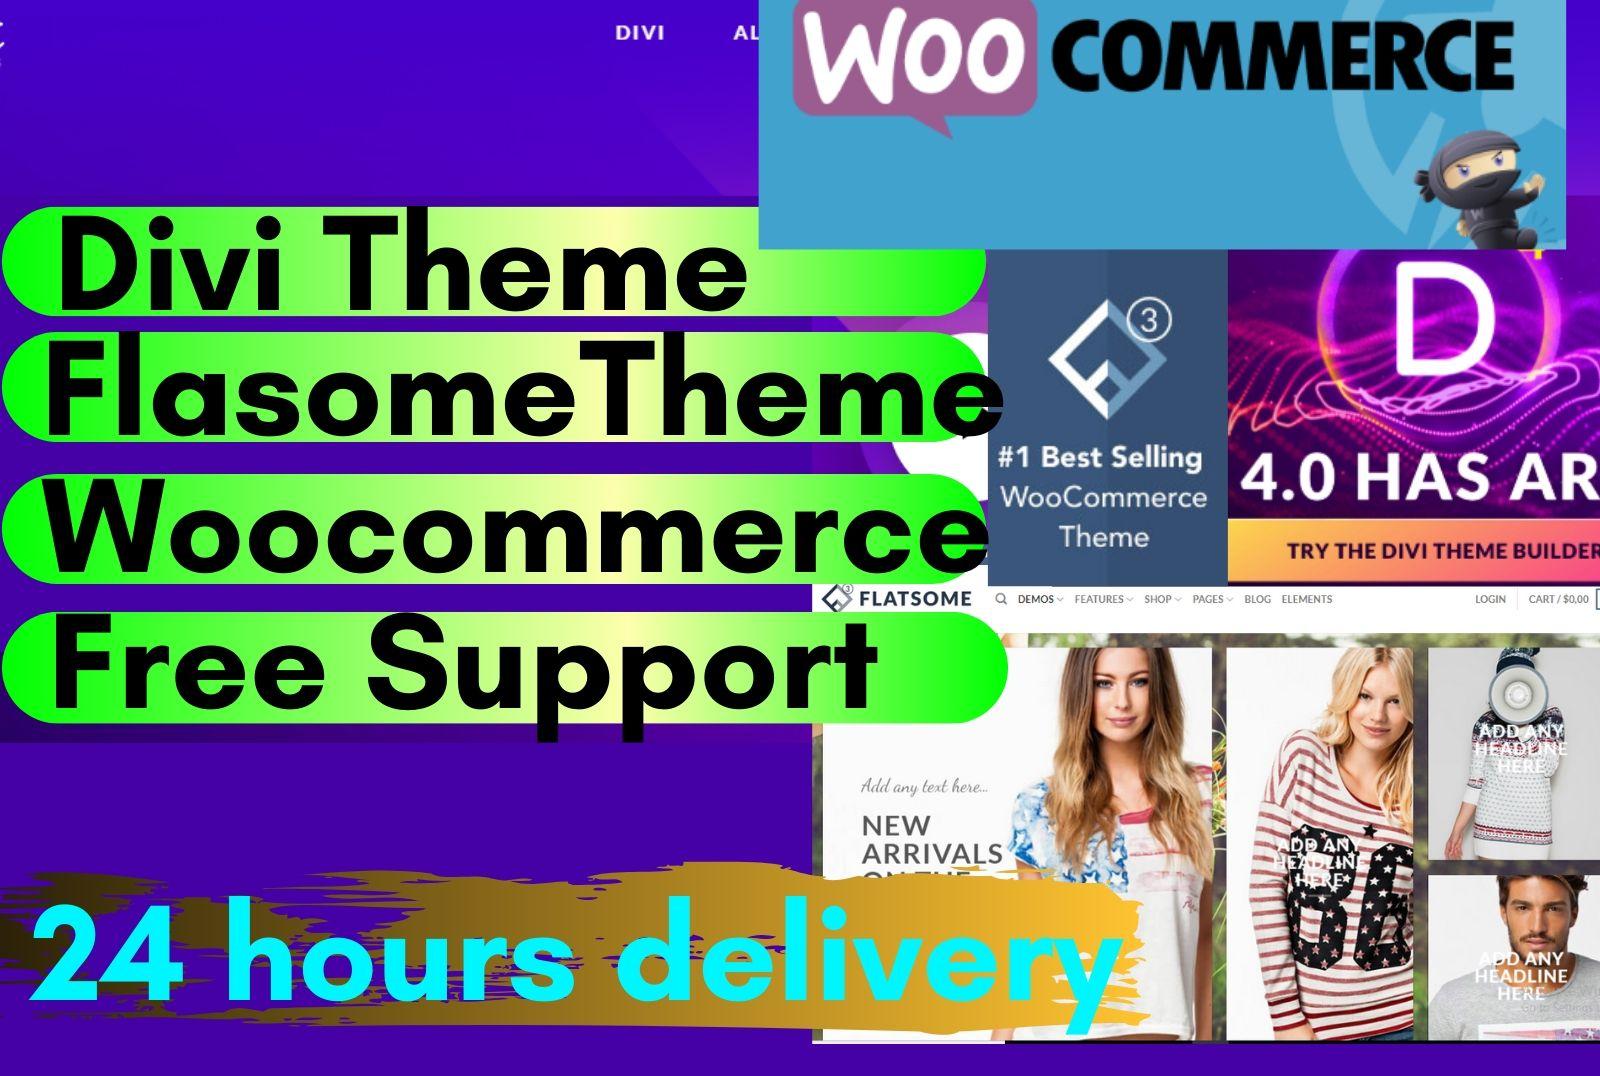 I will create wordpress woocommerce website using divi and flatsome theme